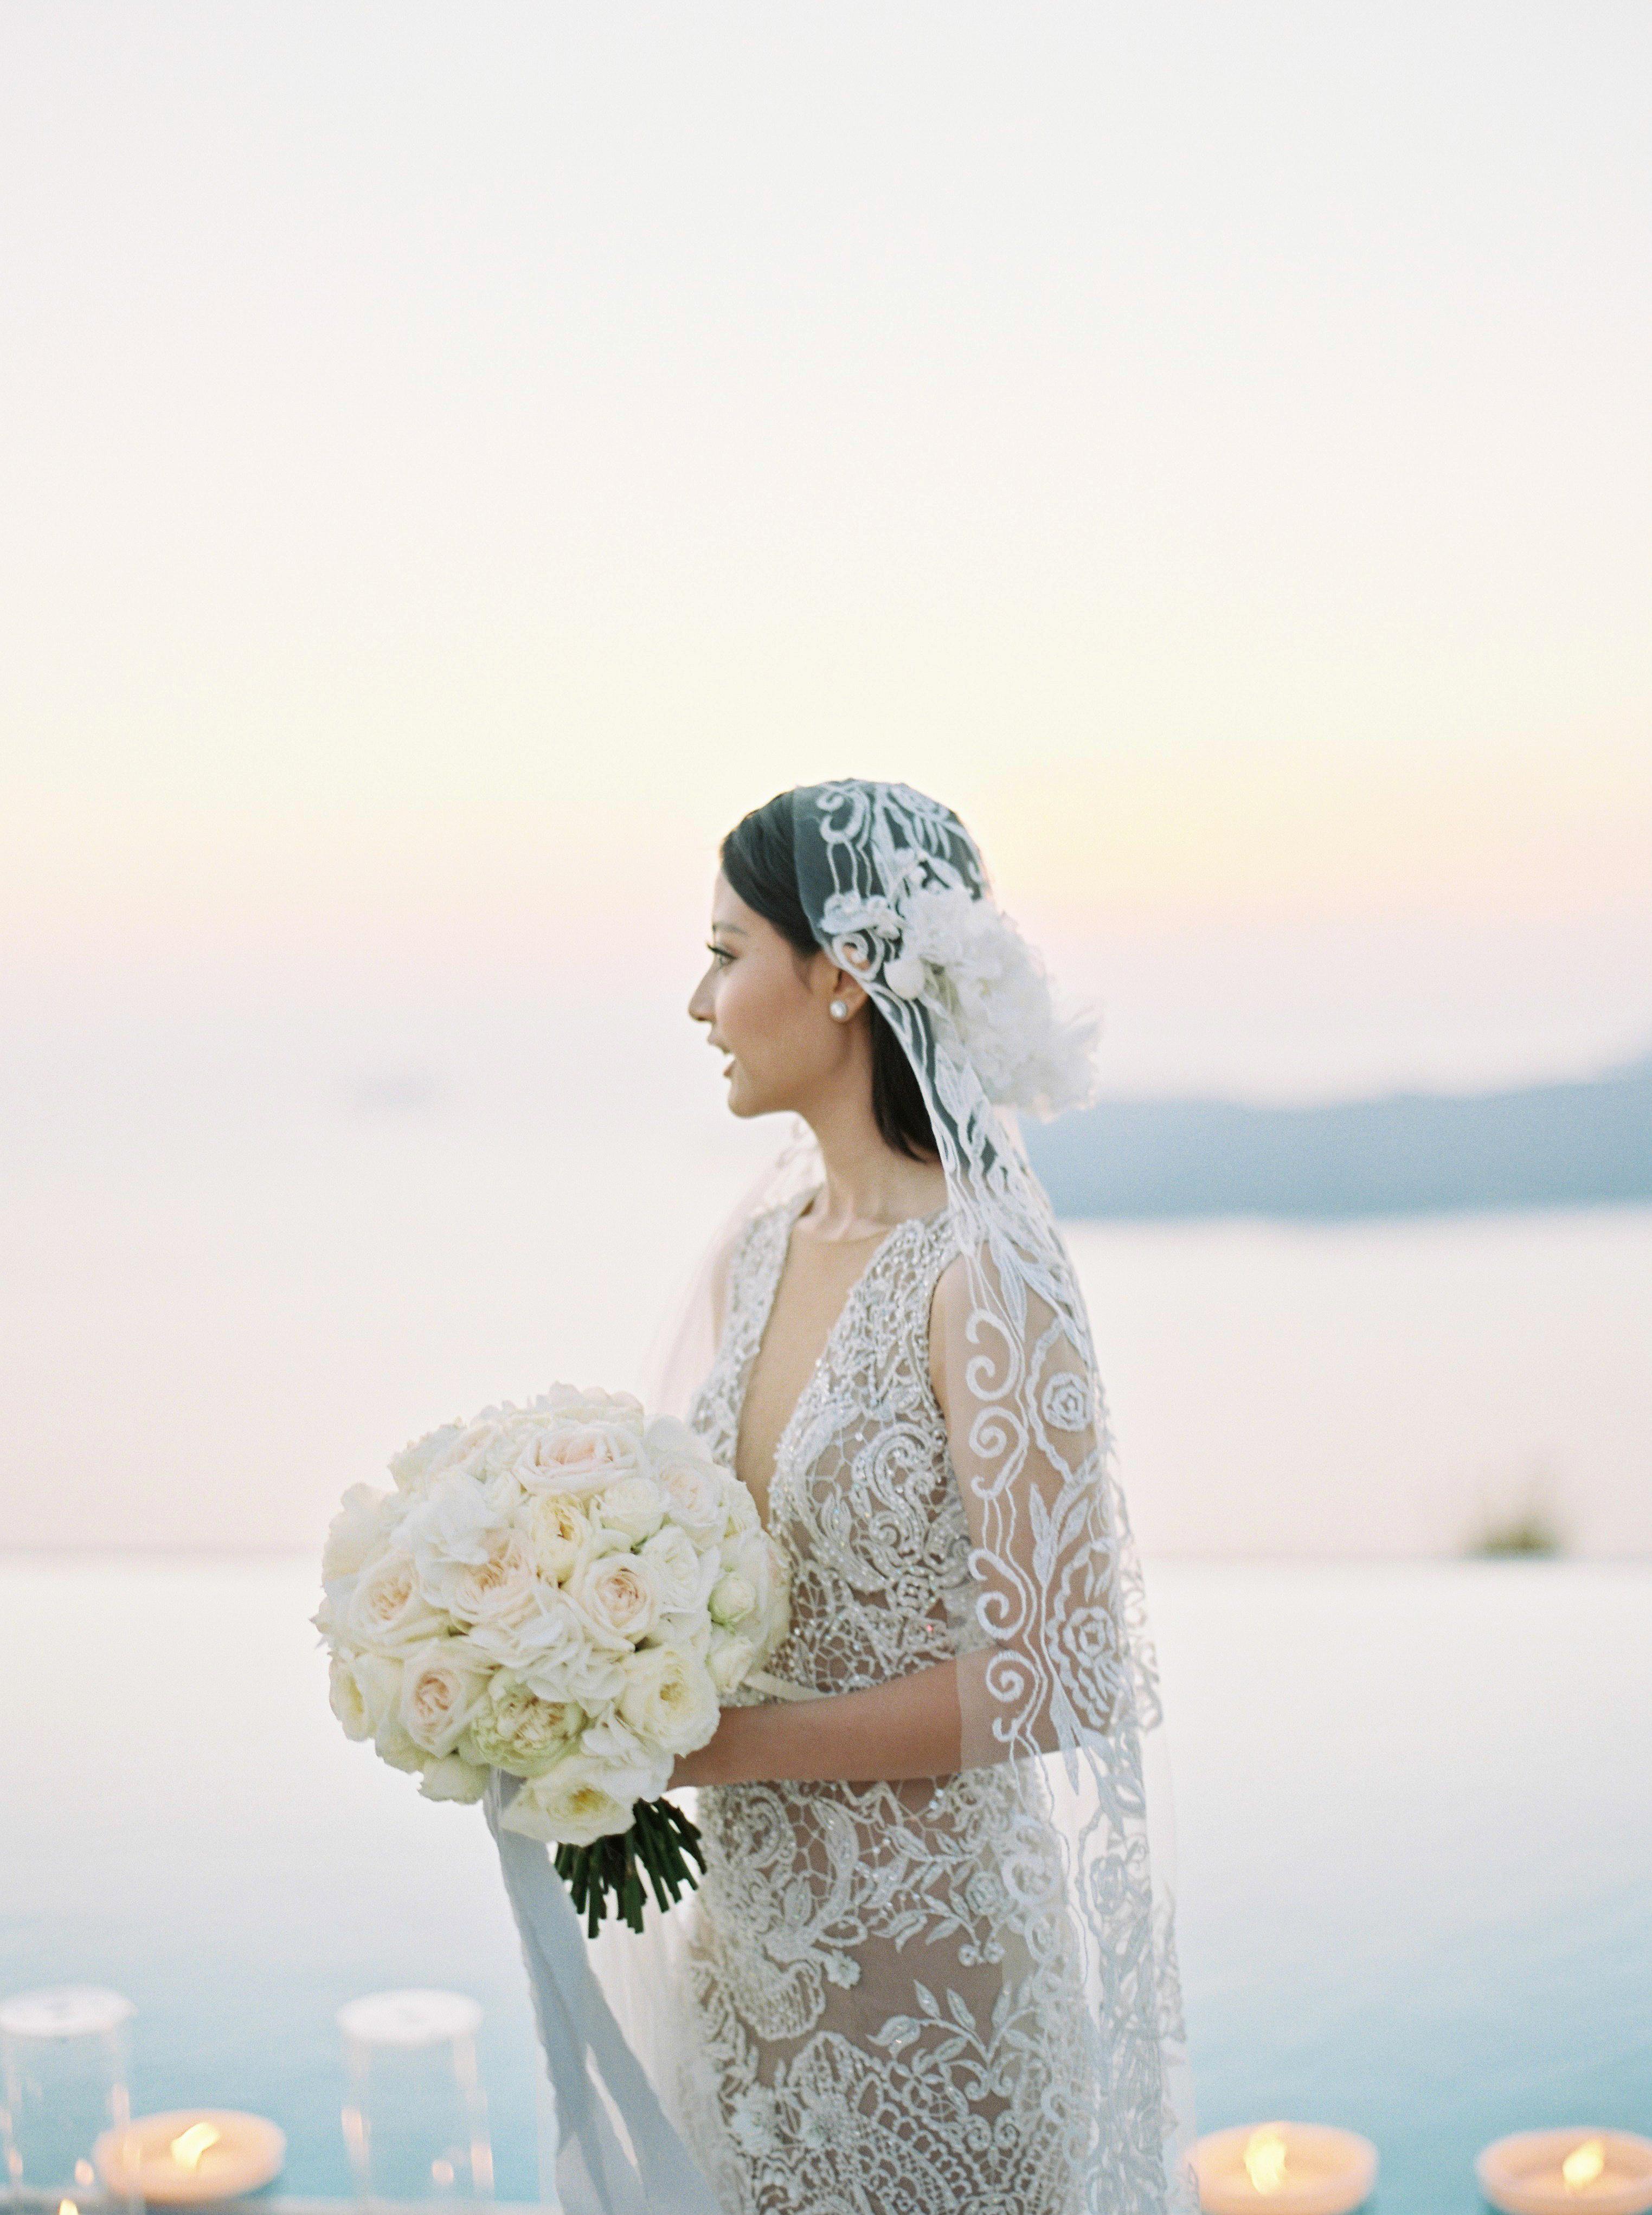 angie prayogo greece wedding bouquet flowers bride